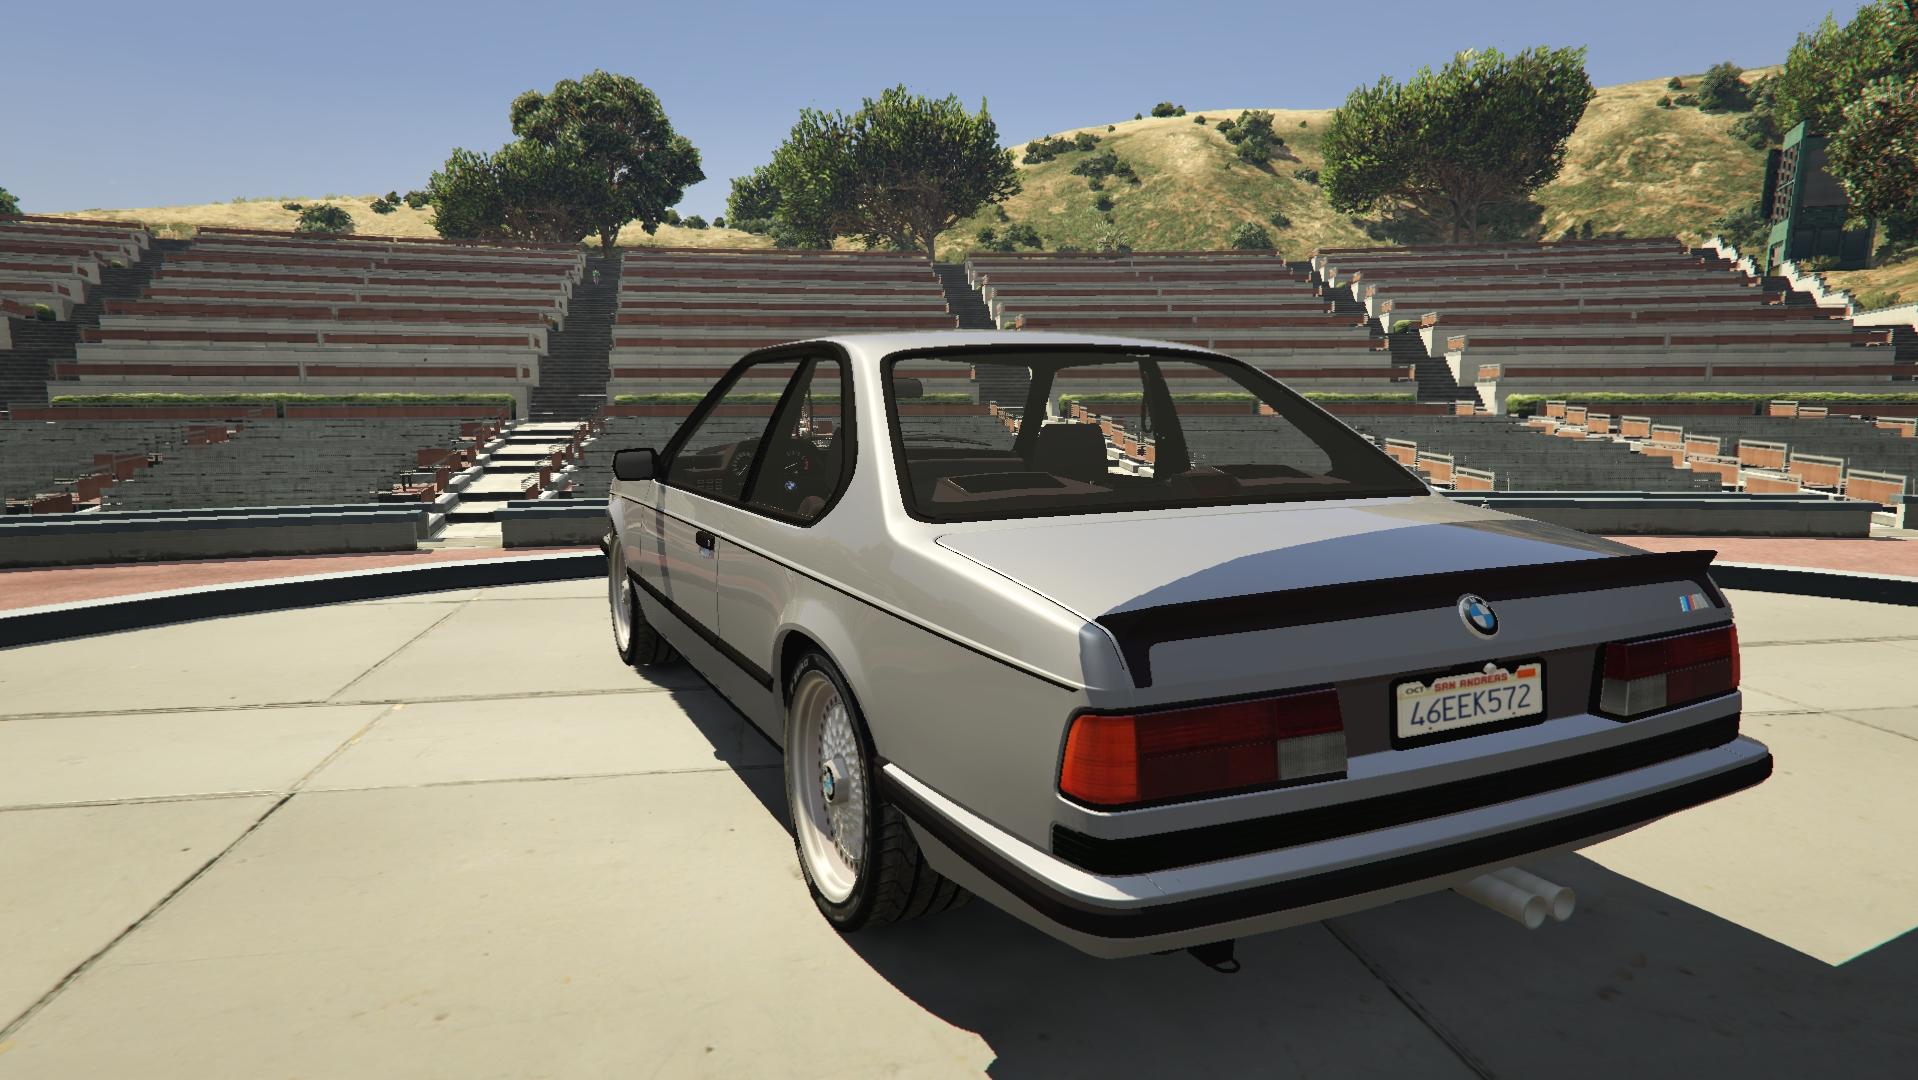 BMW M635 CSI E24 1986 для GTA V - Скриншот 1